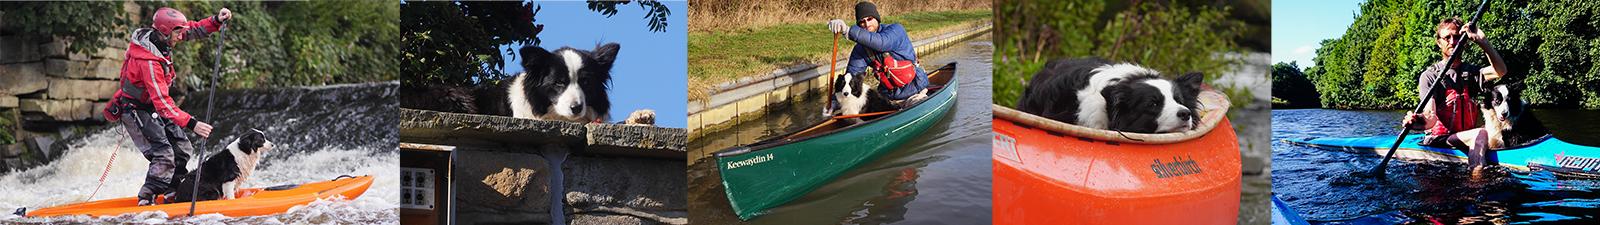 Eira boating - SUP, Canoe, Racing Kayak